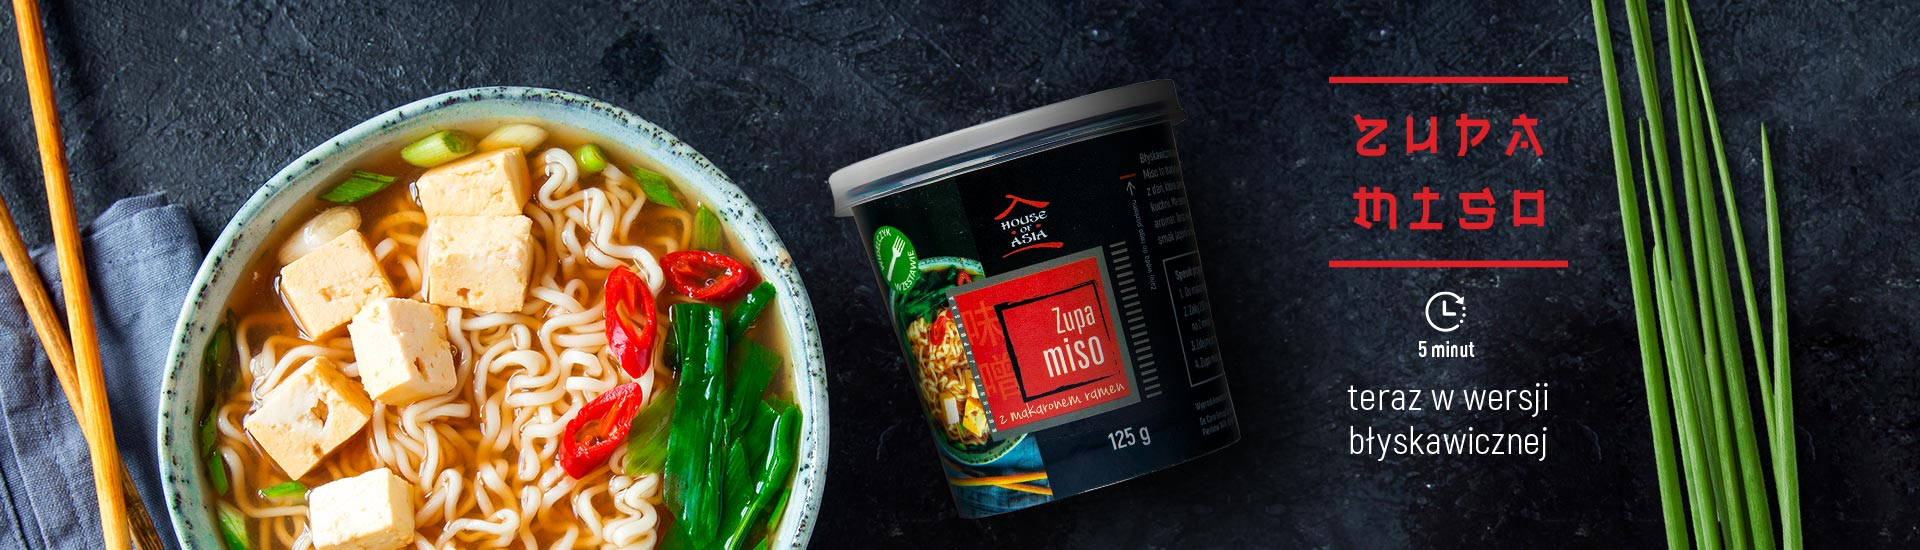 Zupa Miso z makaronem Ramen